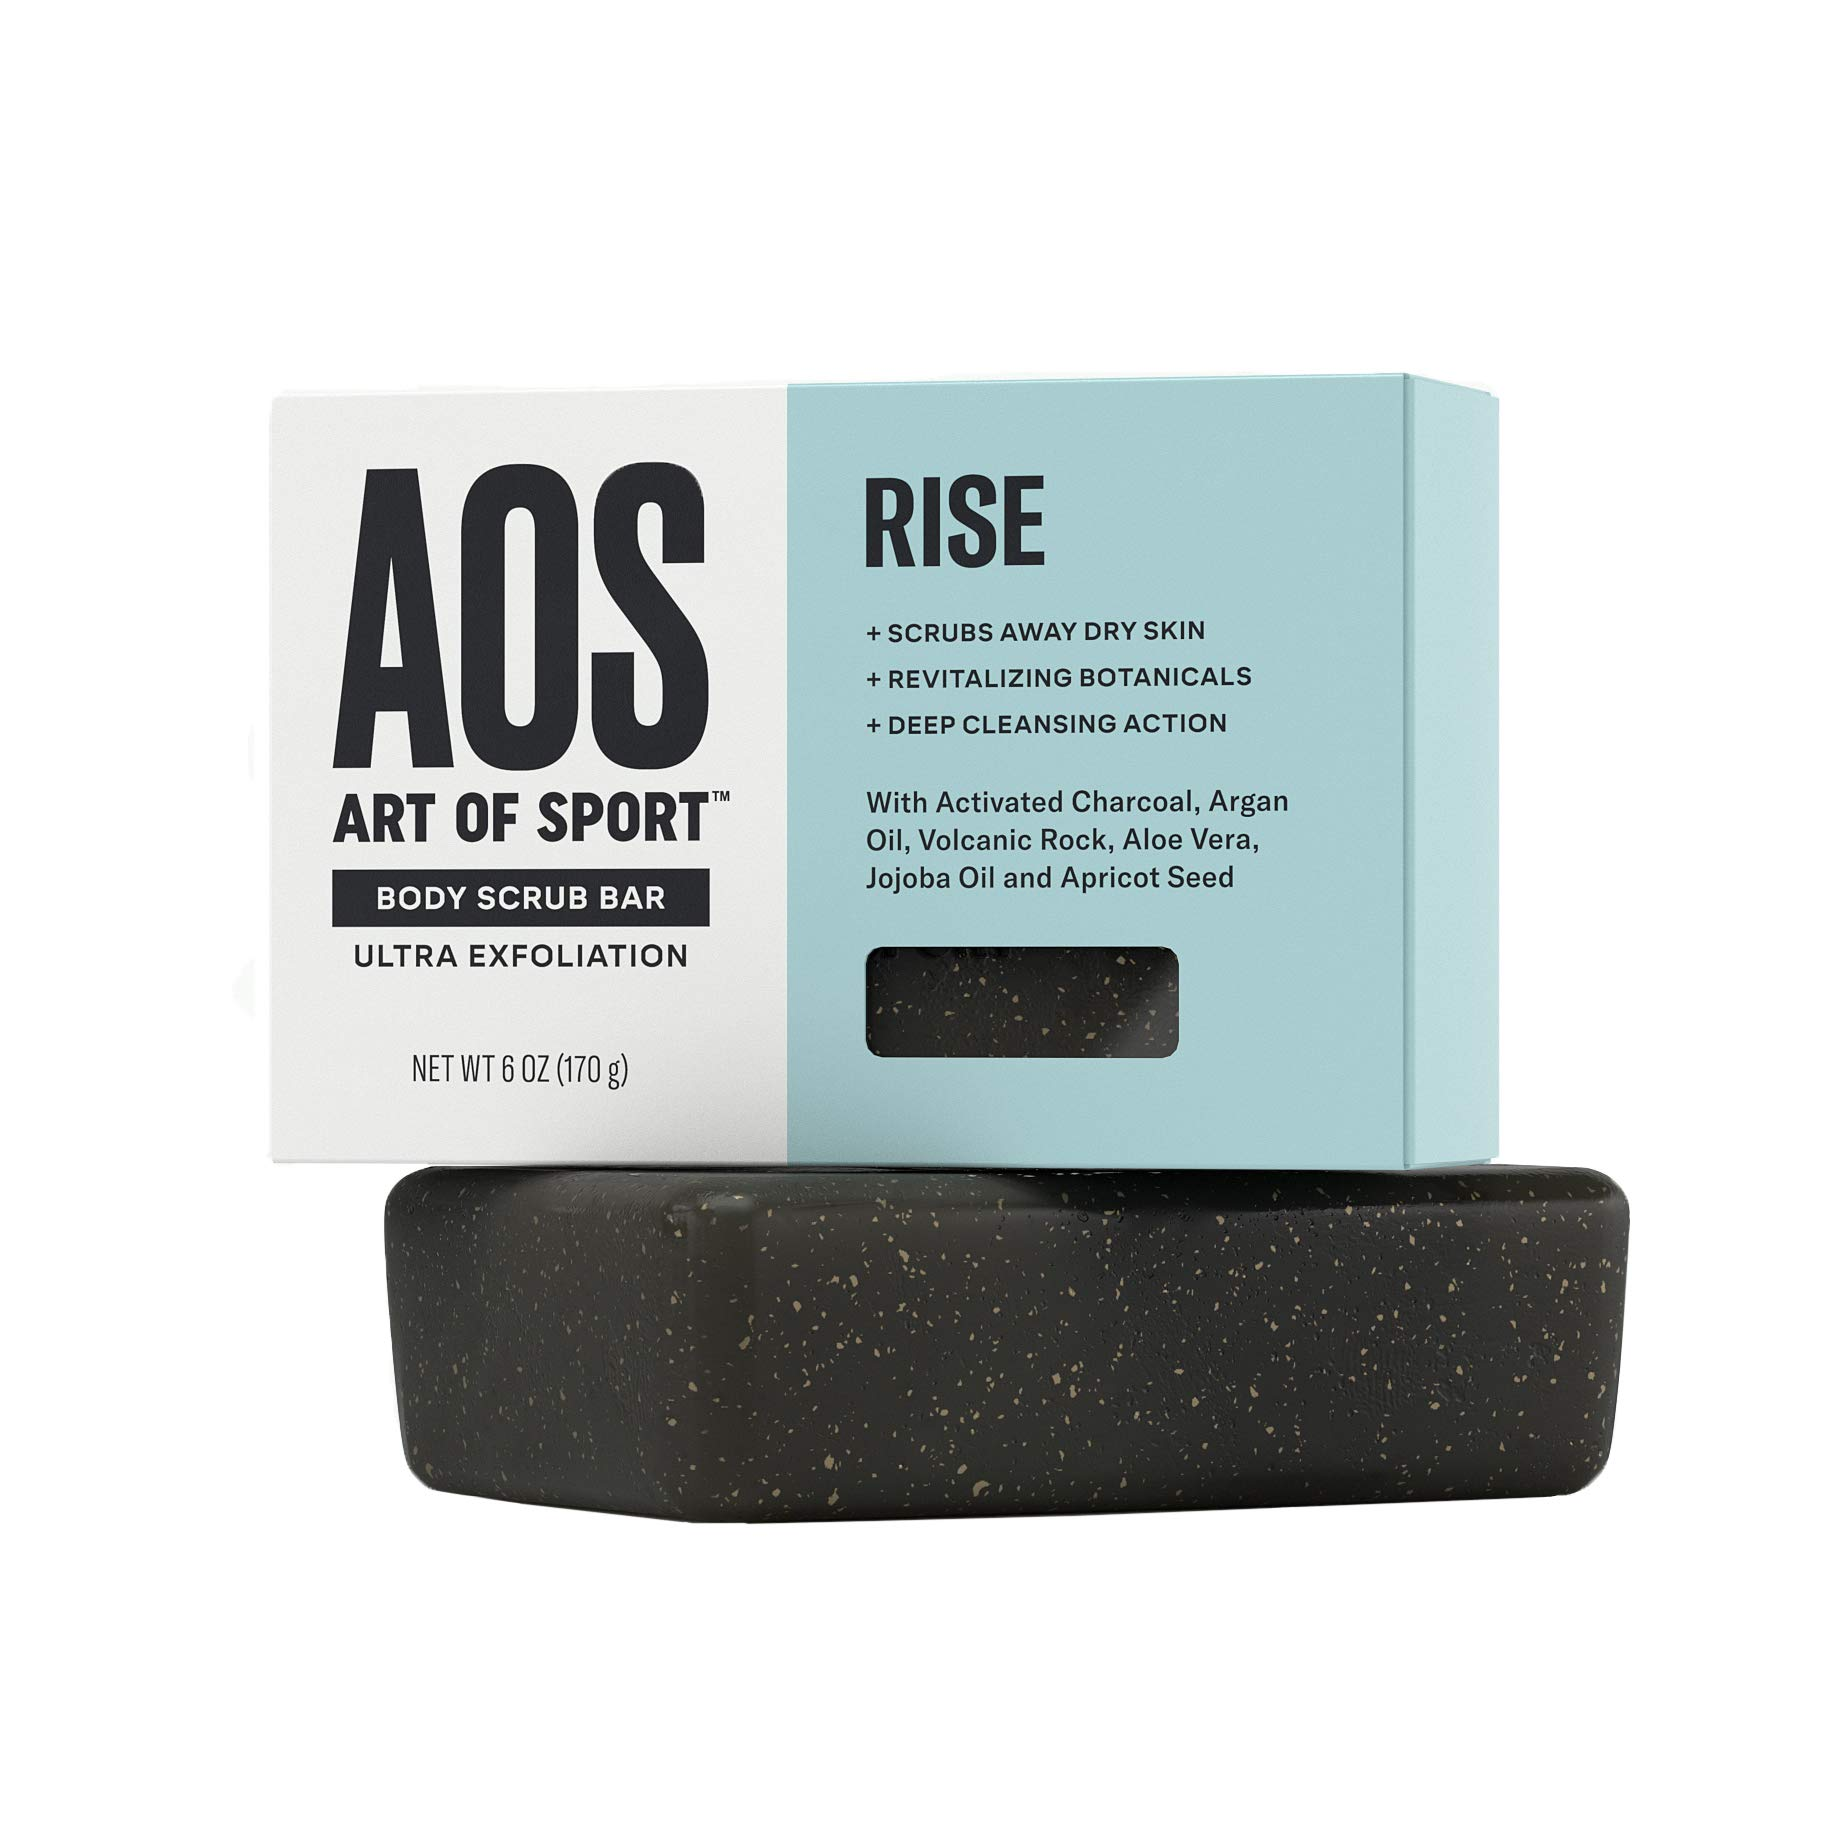 Art of Sport Men's Soap Charcoal Body Scrub Bar   Extra Fresh Rise Scent   Black Soap Bar with Natural Botanicals   Aloe Vera, Jojoba Oil, Argan Oil   Ultra Exfoliation, 6 oz